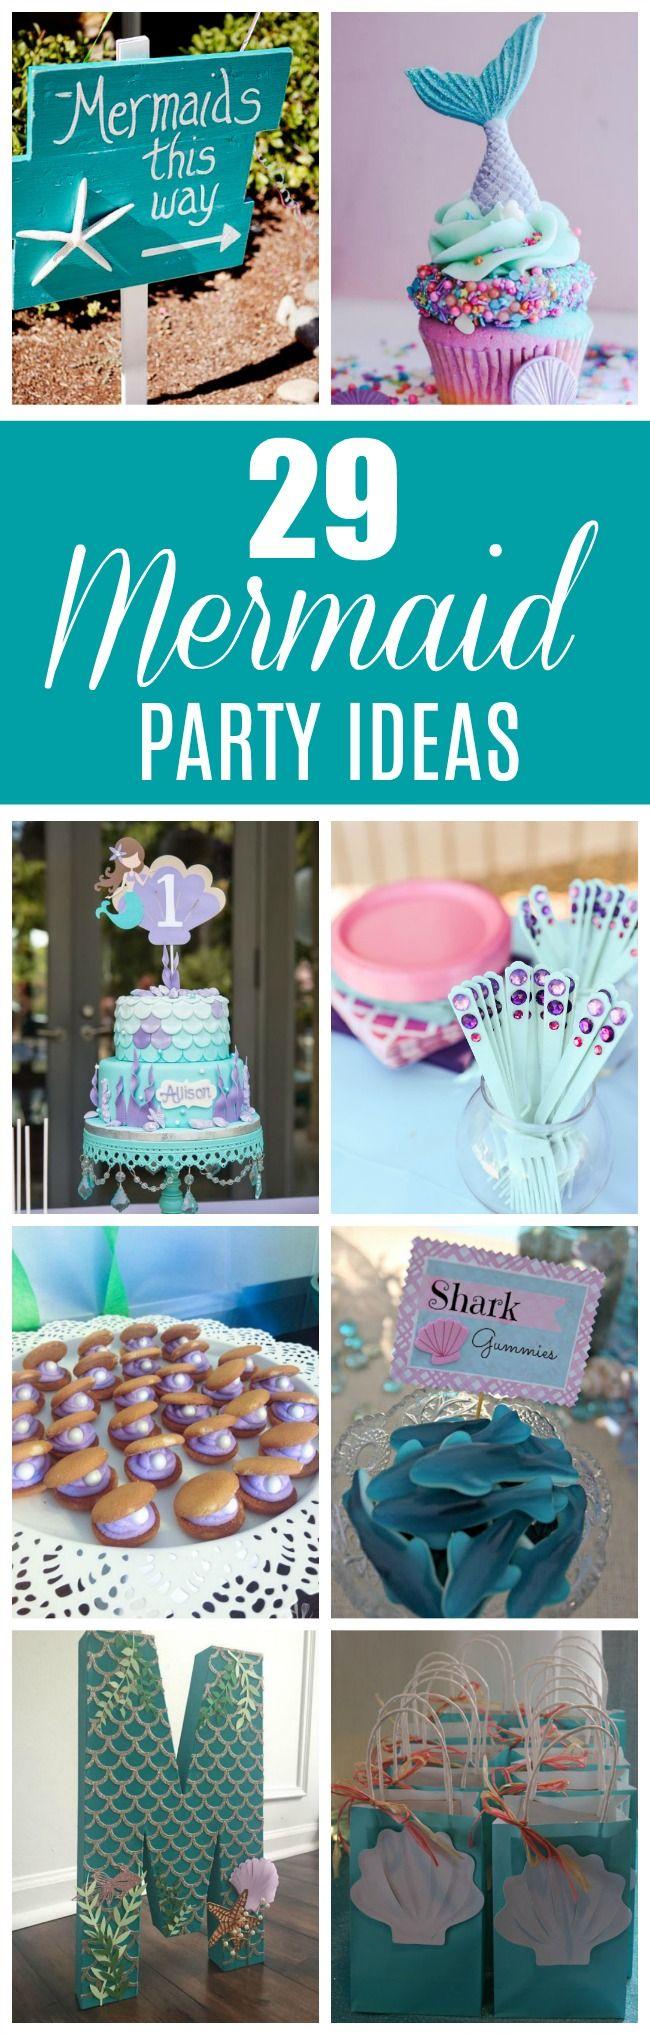 29 Magical Mermaid Party Ideas